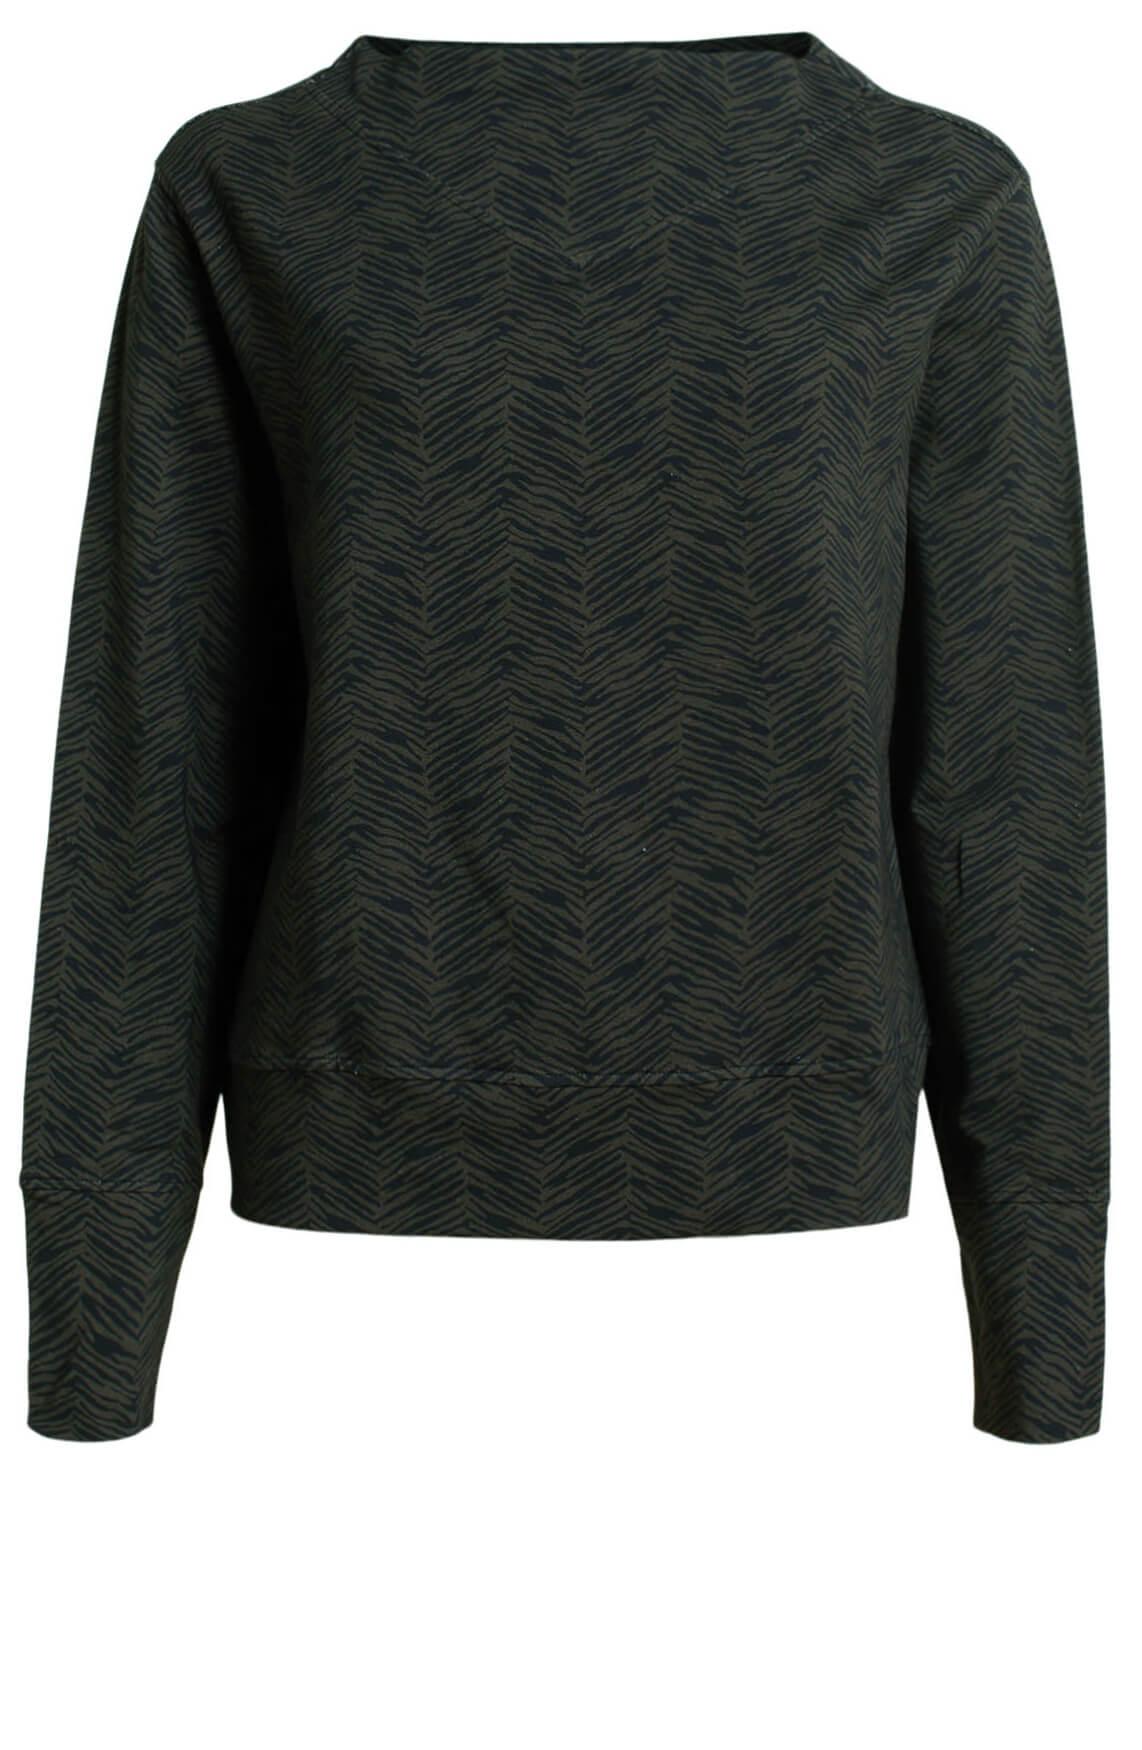 Moscow Dames Tiara sweatshirt Groen